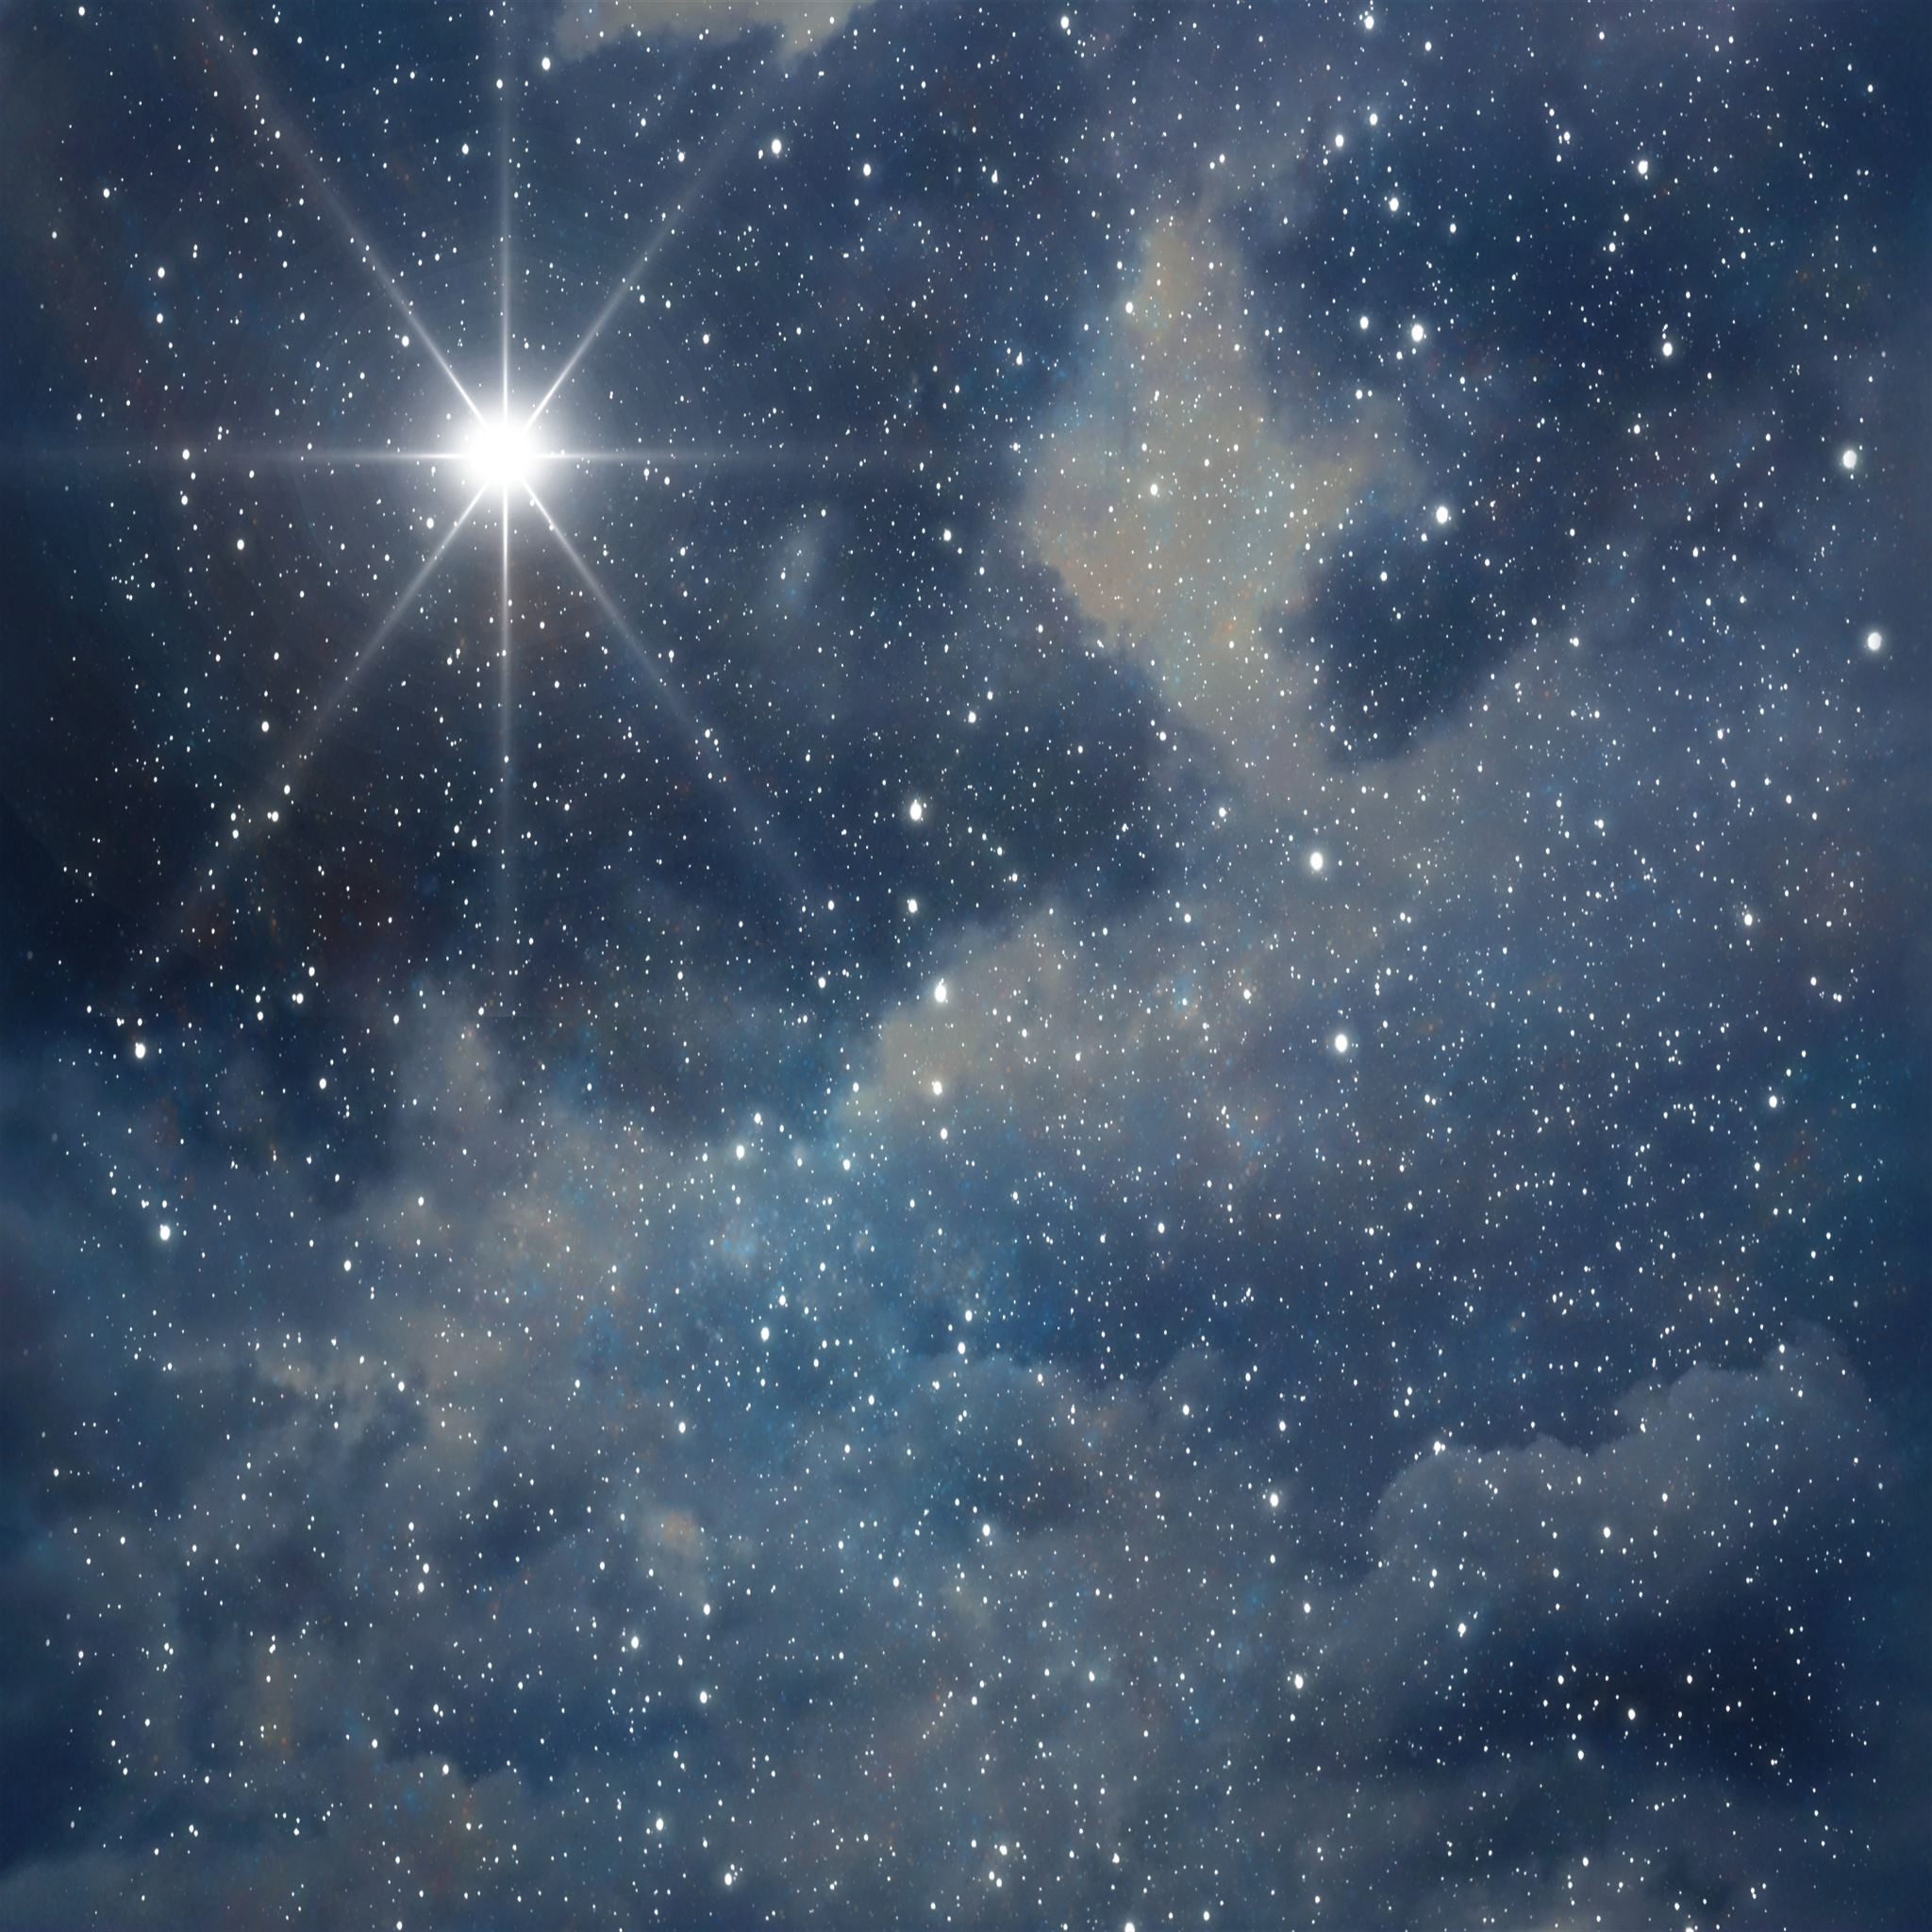 starry sky wallpaper tumblr - photo #41